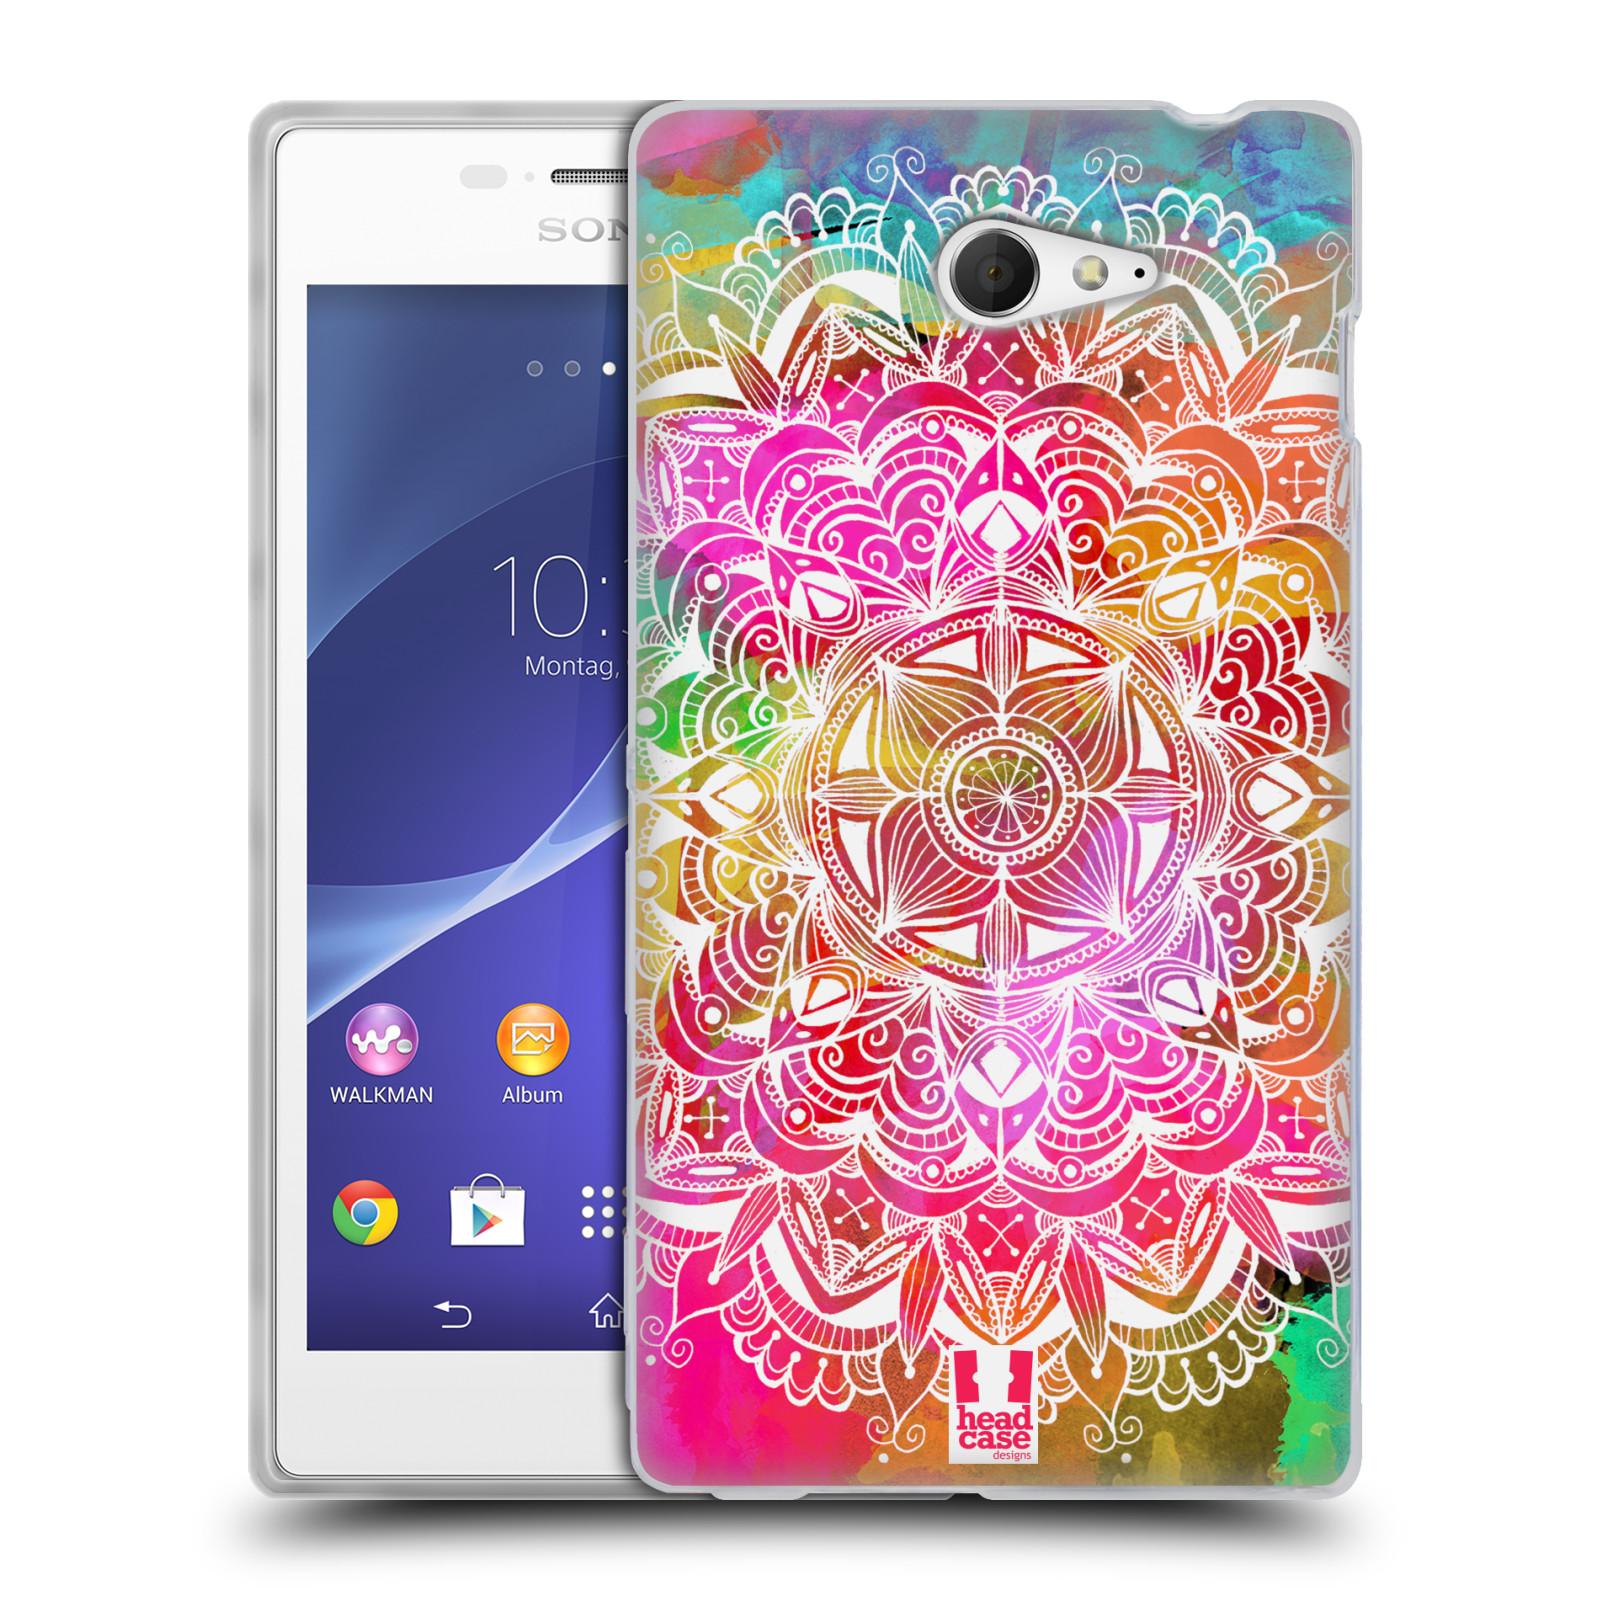 Silikonové pouzdro na mobil Sony Xperia M2 D2303 HEAD CASE Mandala Doodle Watercolour (Silikonový Kryt či obal na mobilní telefon Sony Xperia M2)